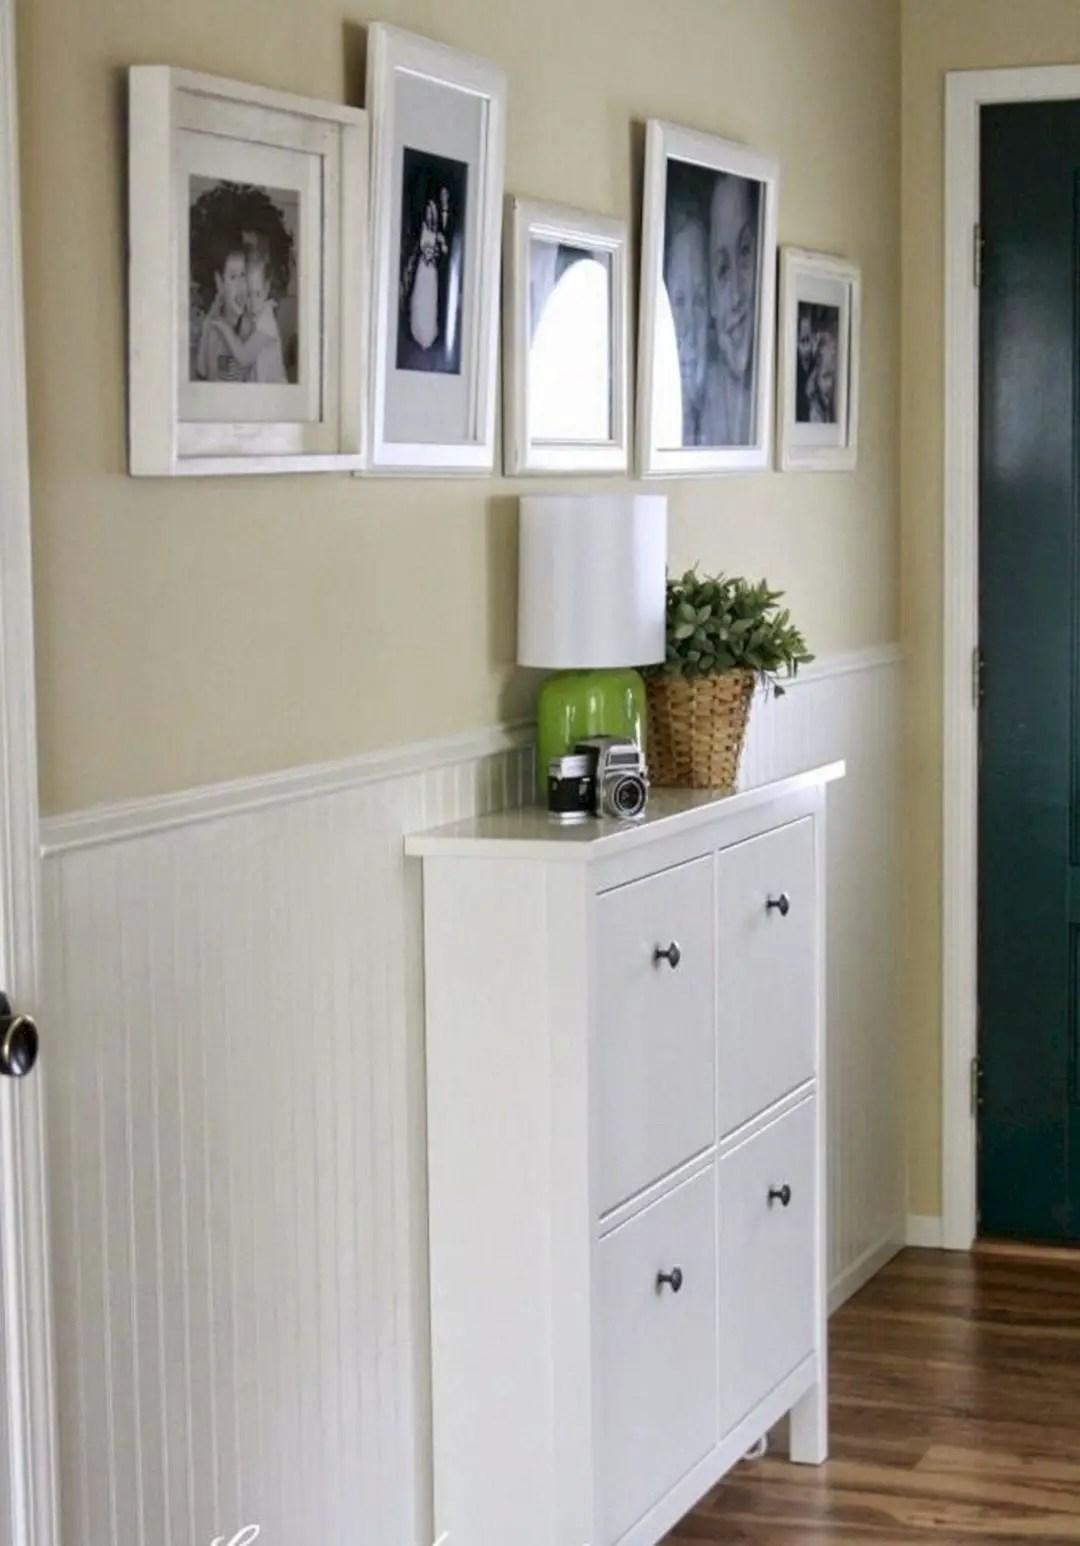 Narrow-entryway-shoe-cabinet-in-ikea-design